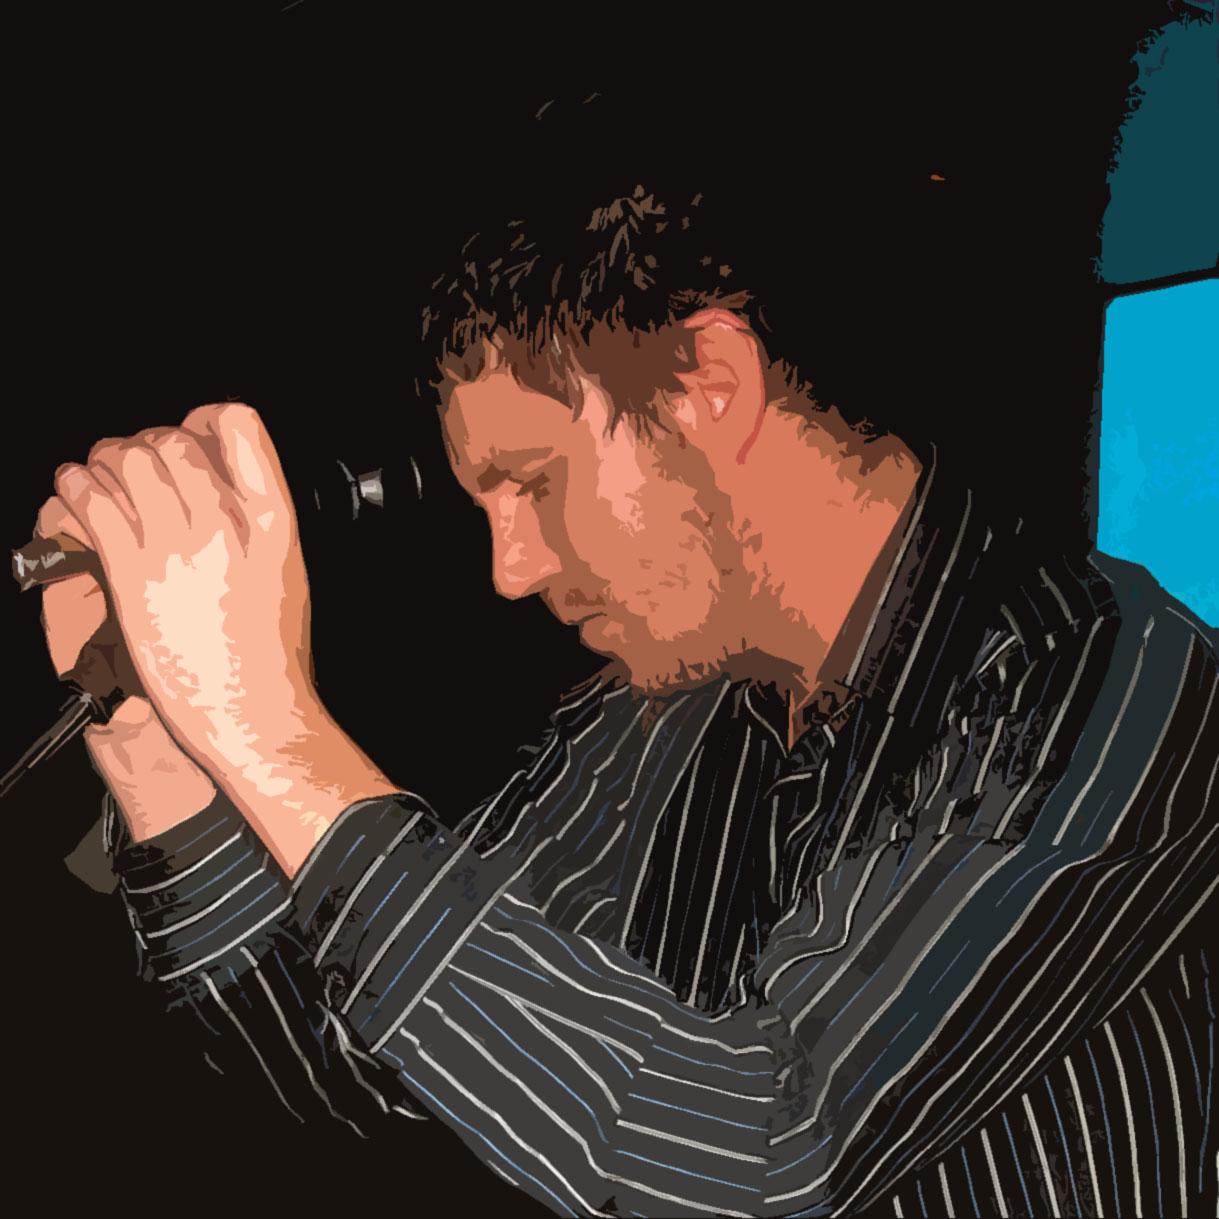 Robbie on stage - 2011